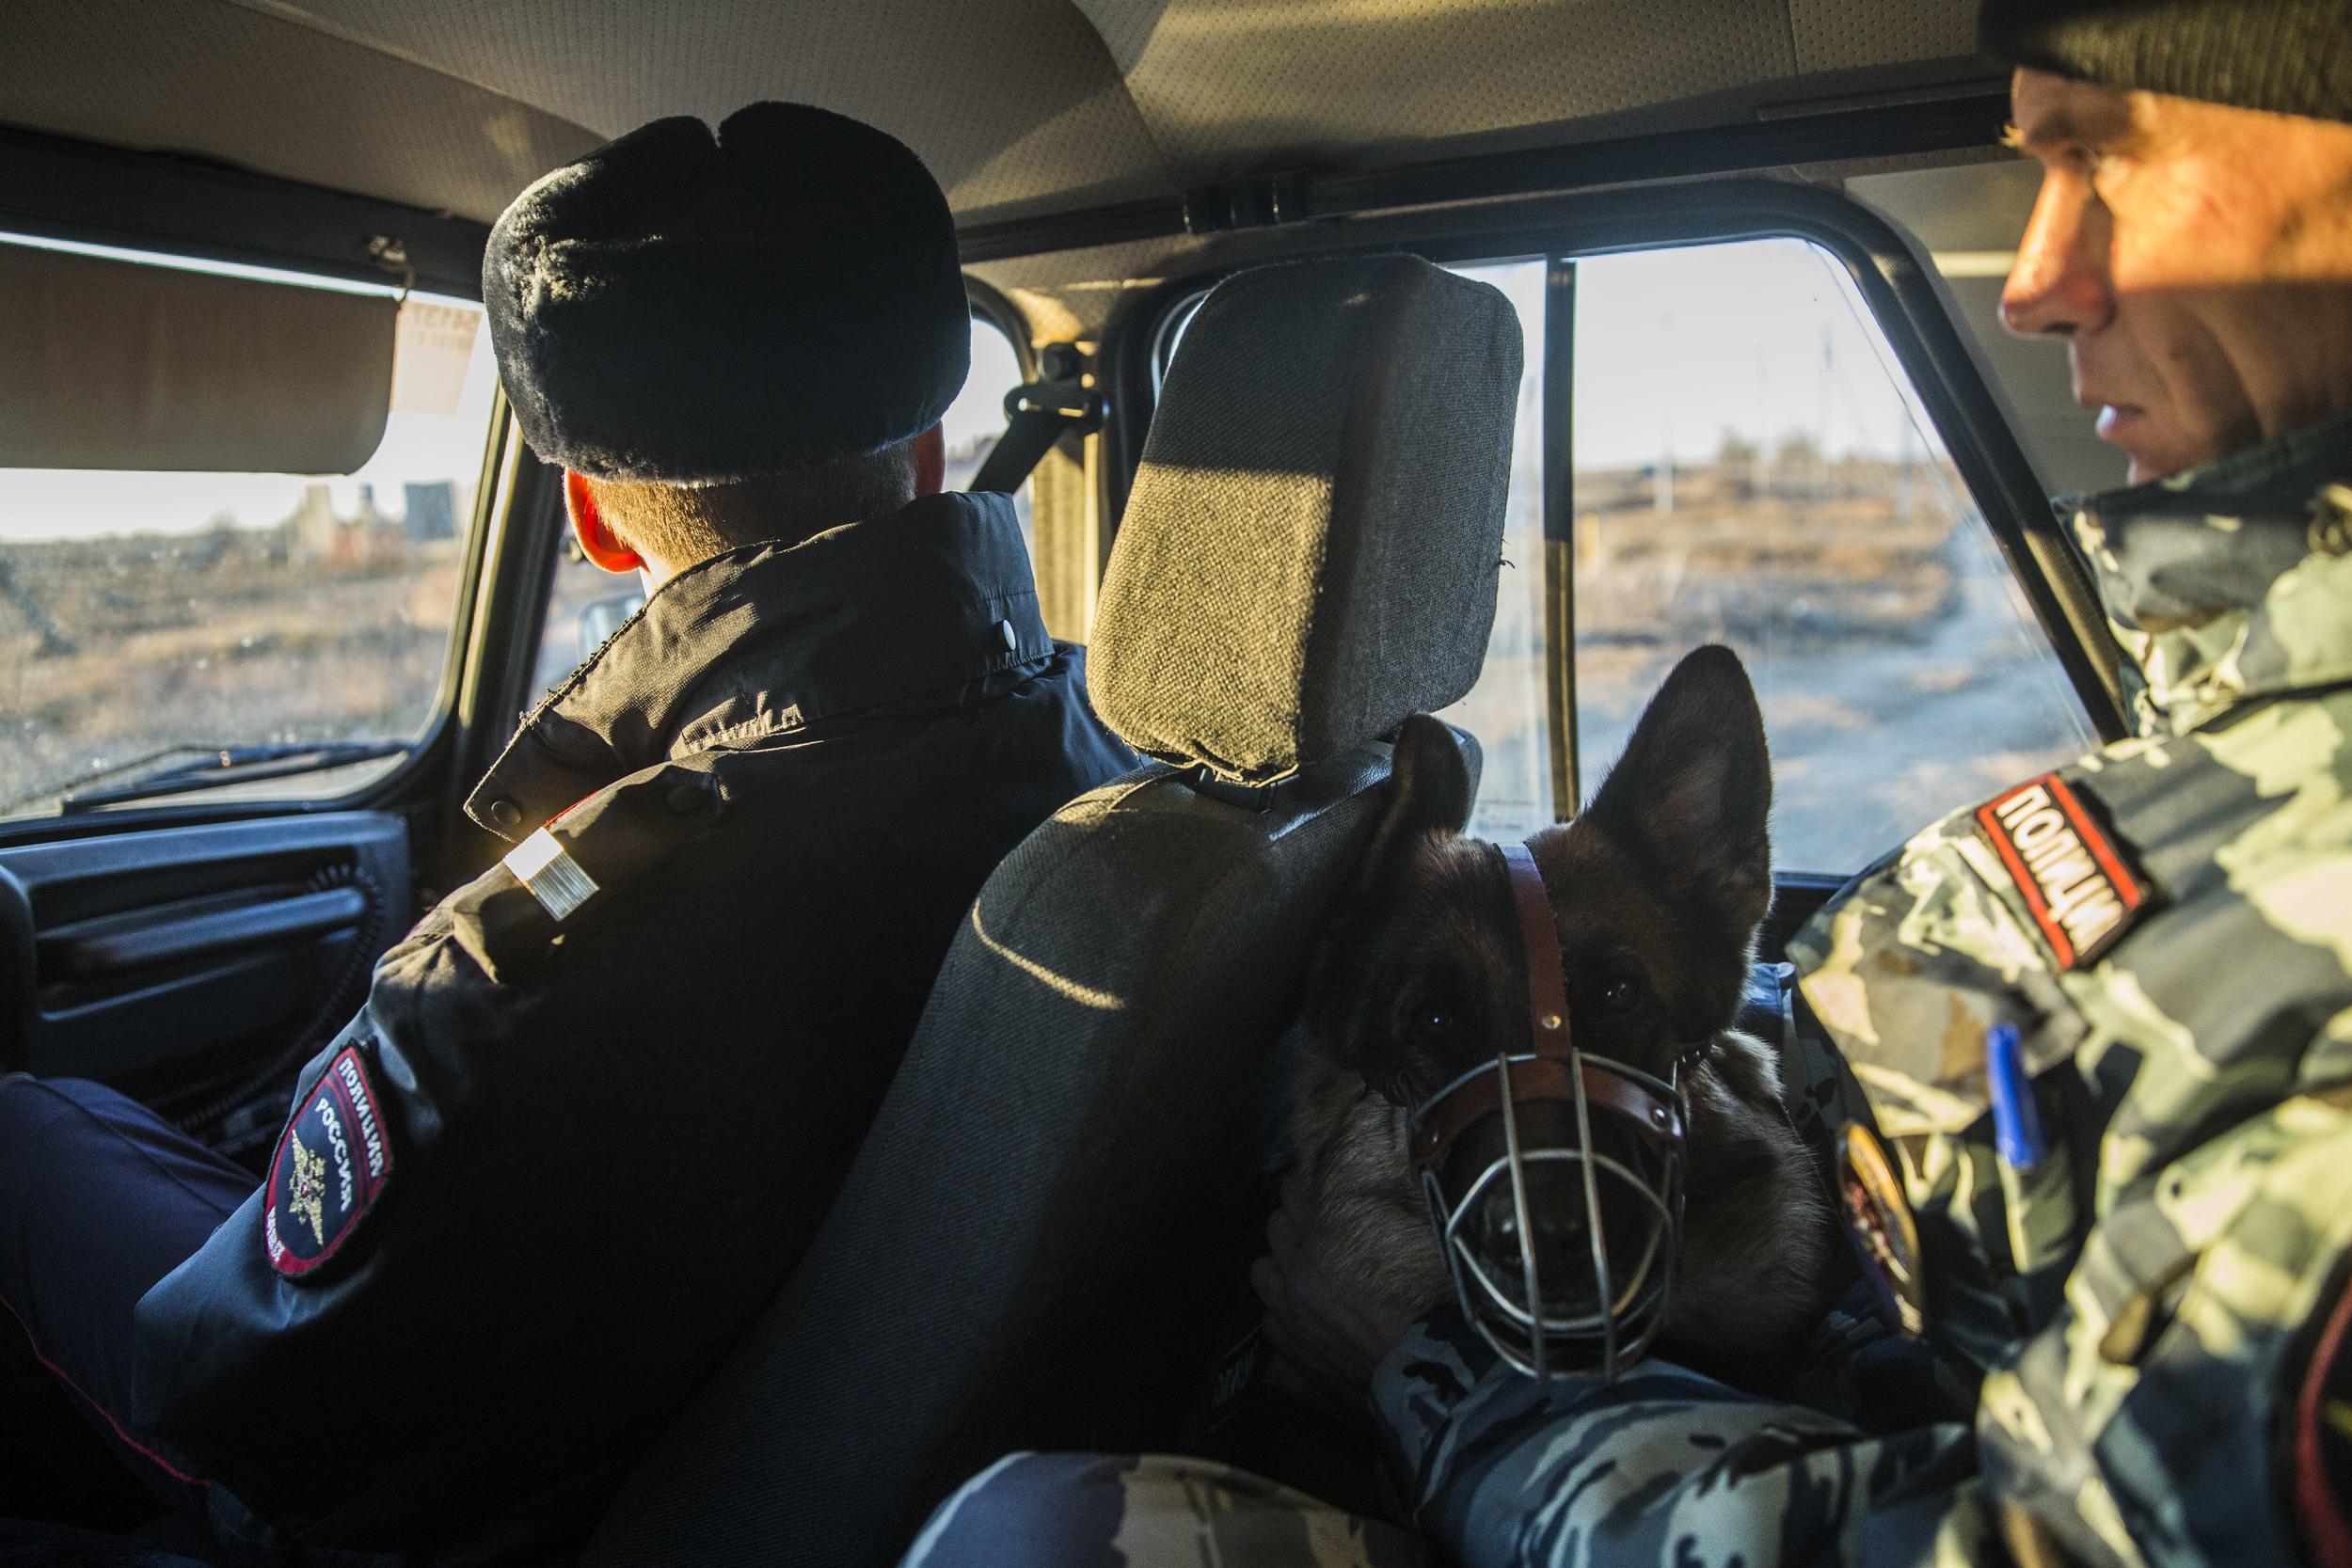 Local police patrol